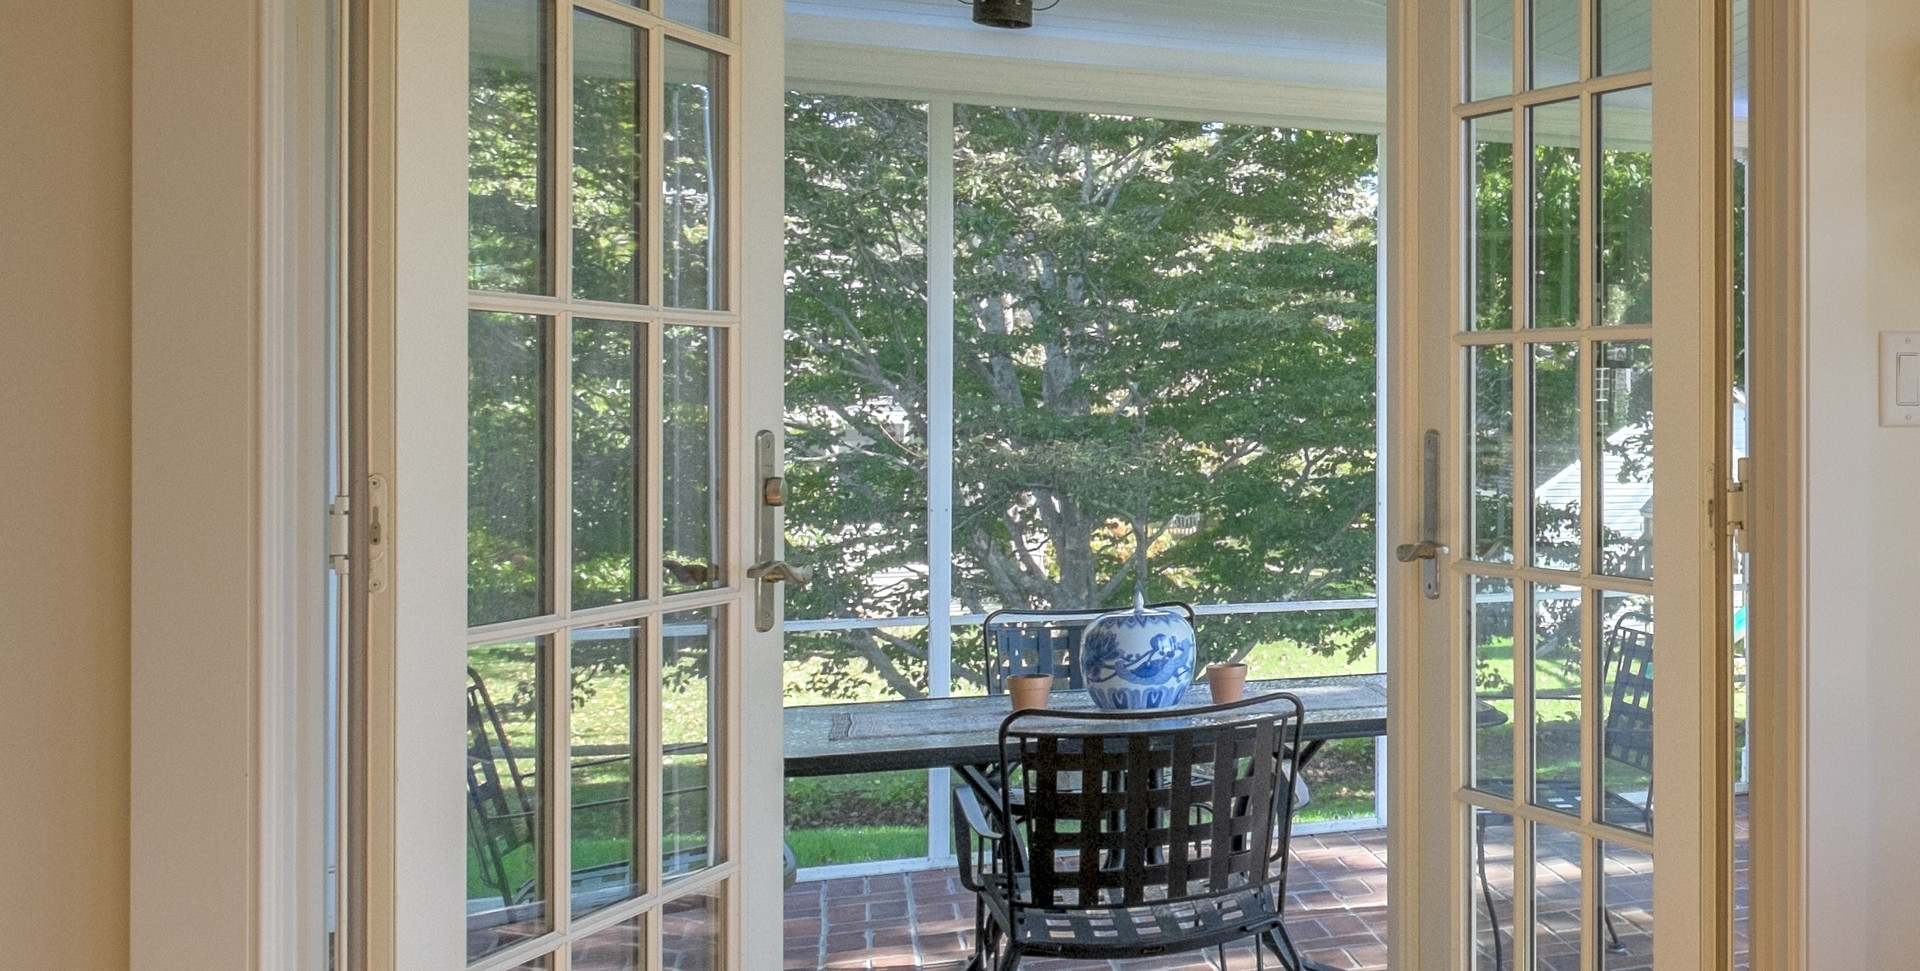 Old Village, Chatham,MA Historic Preservation Remodel, Outdoor living